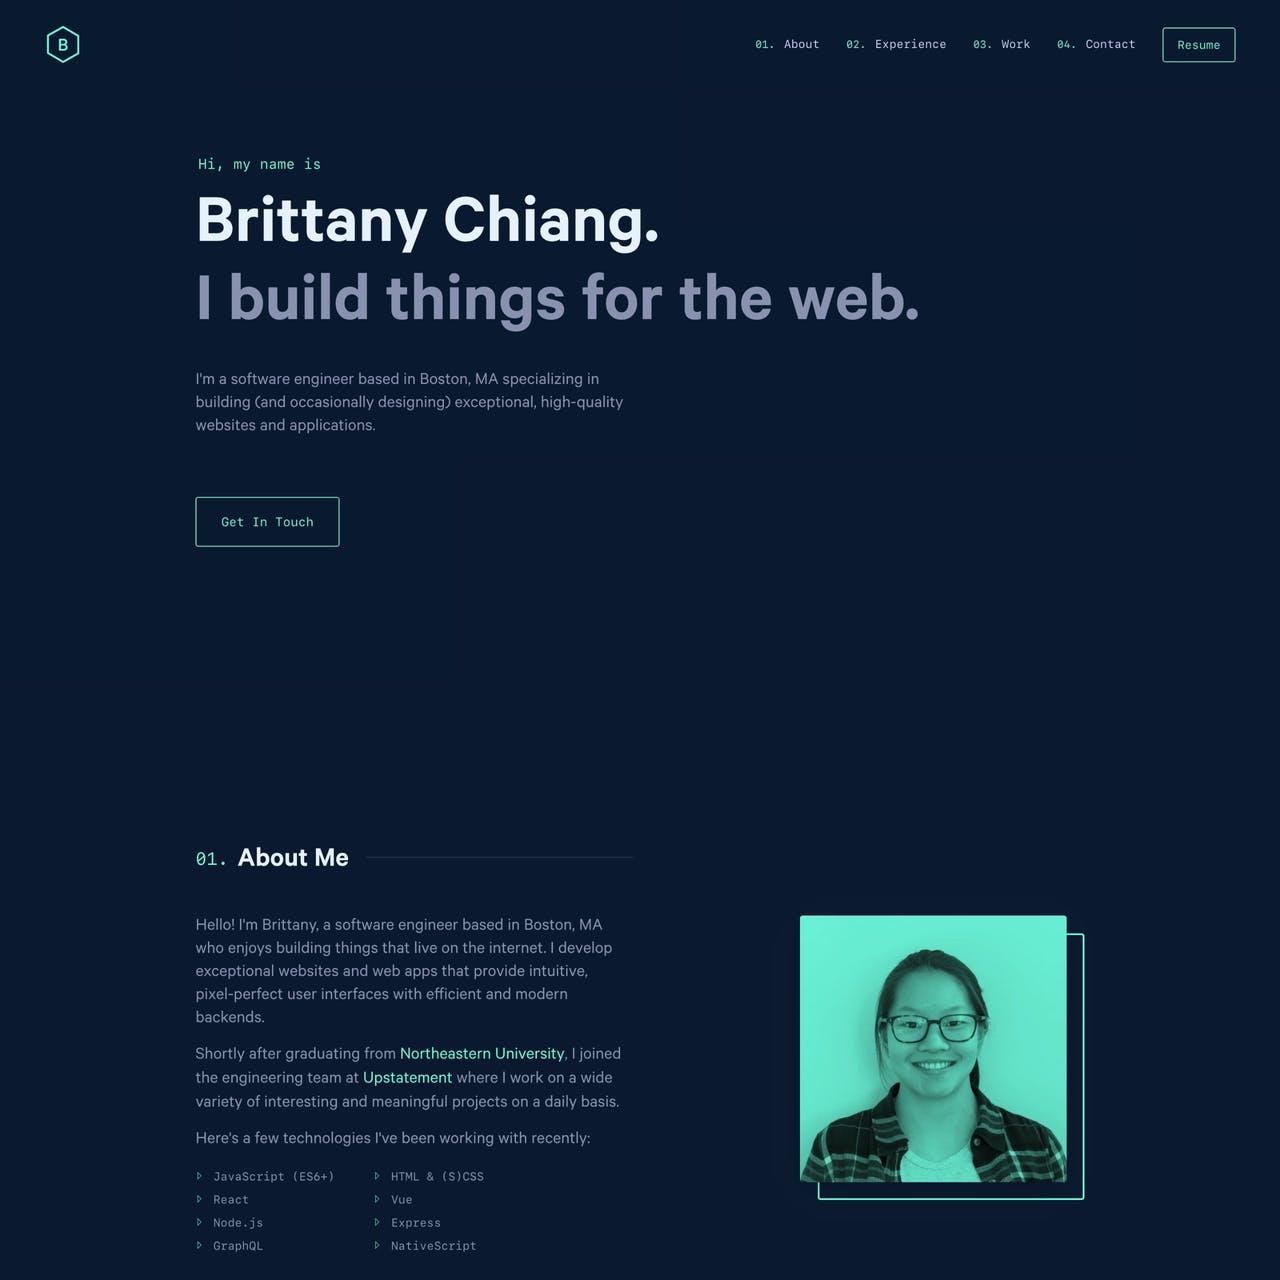 Brittany Chiang Website Screenshot